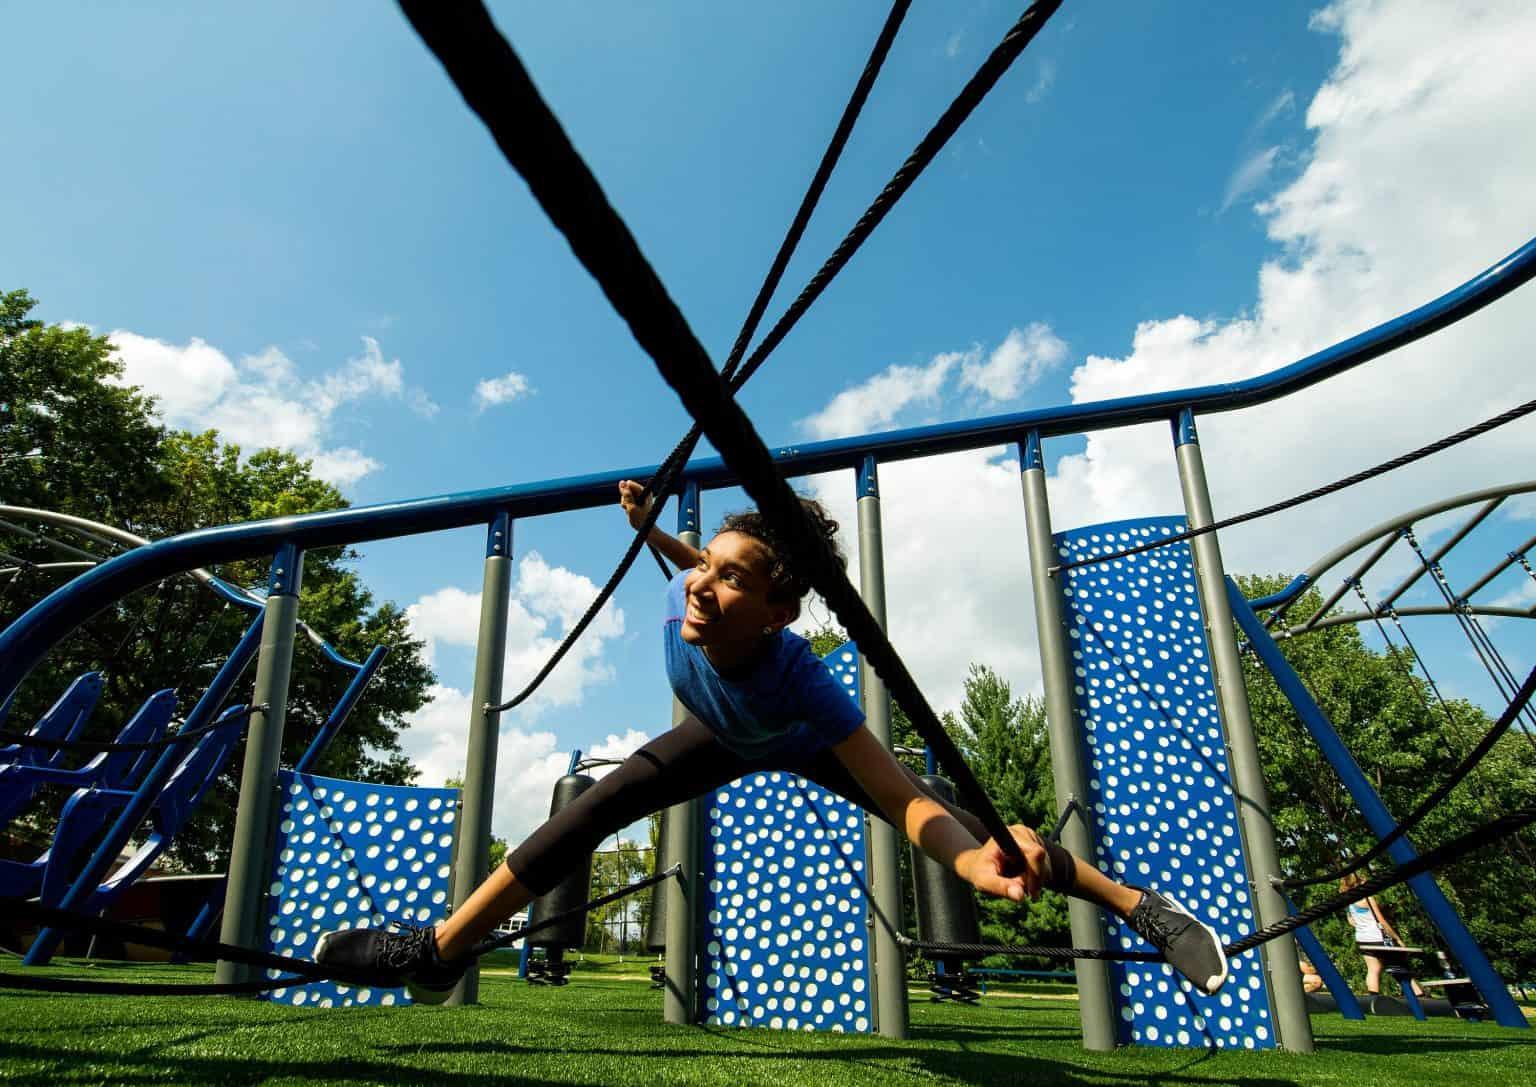 outdoor-fitness-equipment_49644089152_o-1536x1087